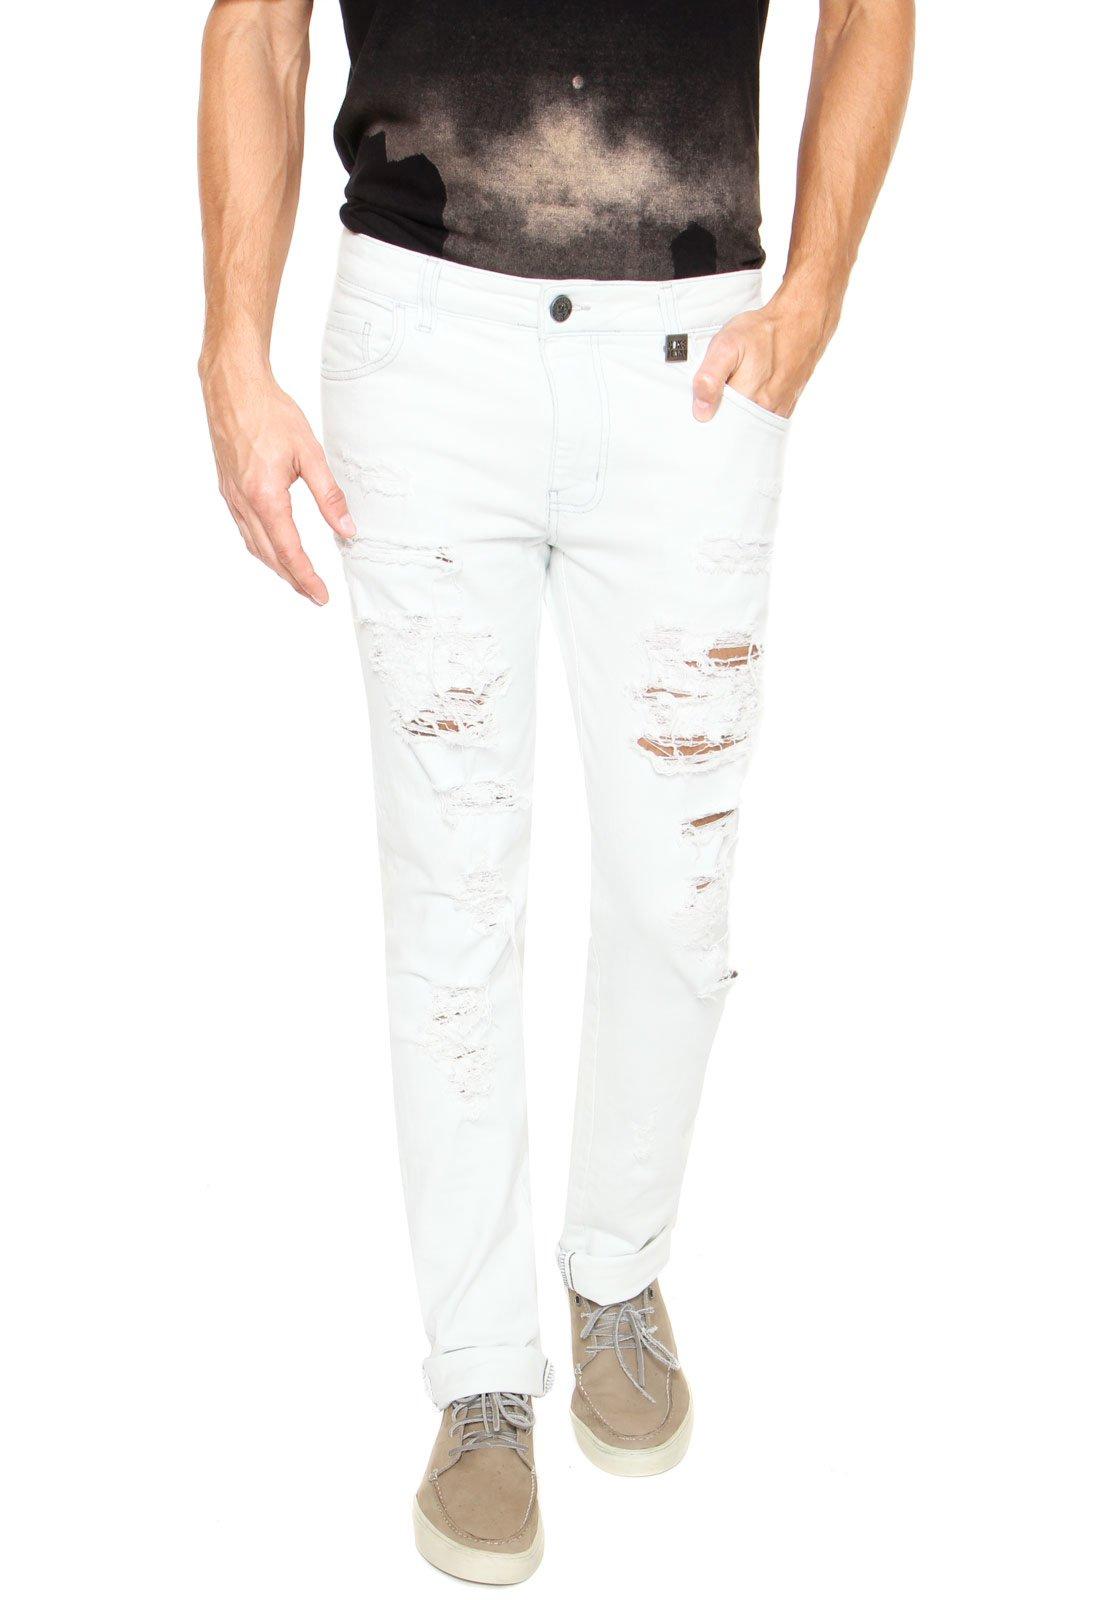 391af11e5 Coca-Cola Jeans. Calça Jeans Coca-Cola Jeans Skinny Destroyed Azul